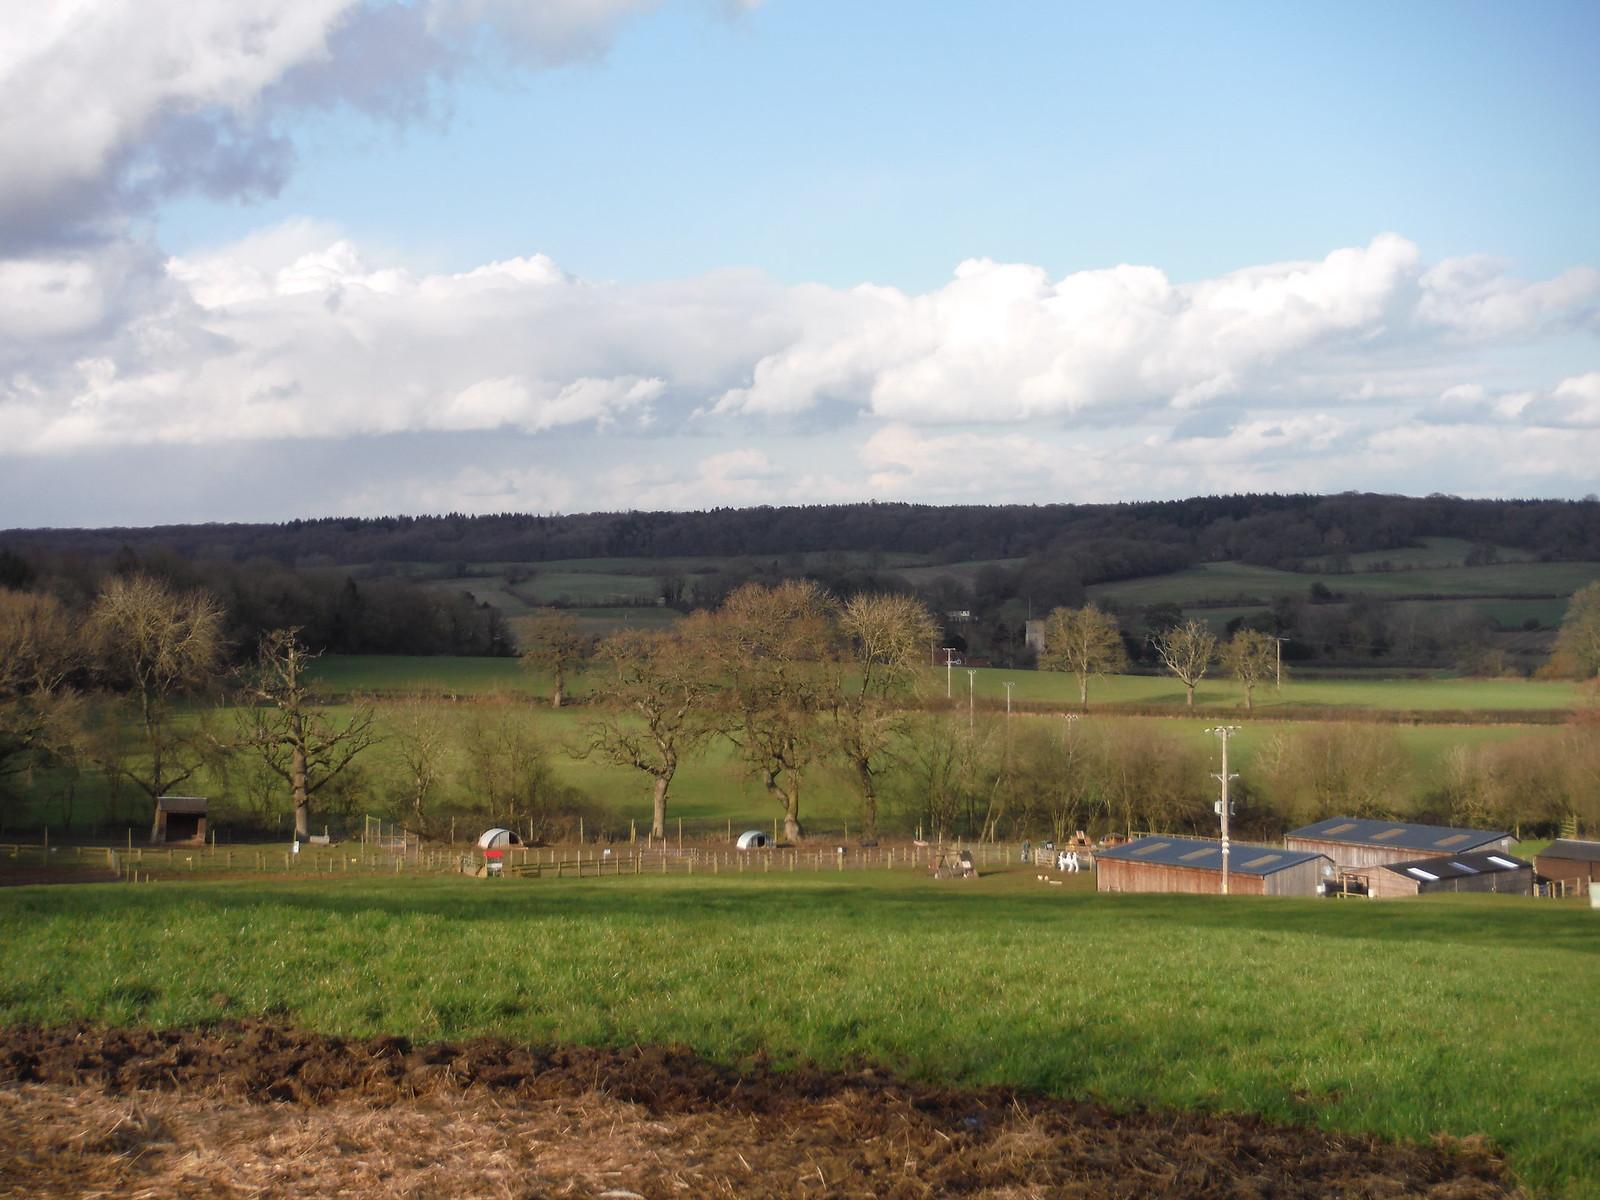 Hawkridge Wood across the Pang Valley, from Bucklebury Farm Park SWC Walk 117 Aldermaston to Woolhampton (via Stanford Dingley)